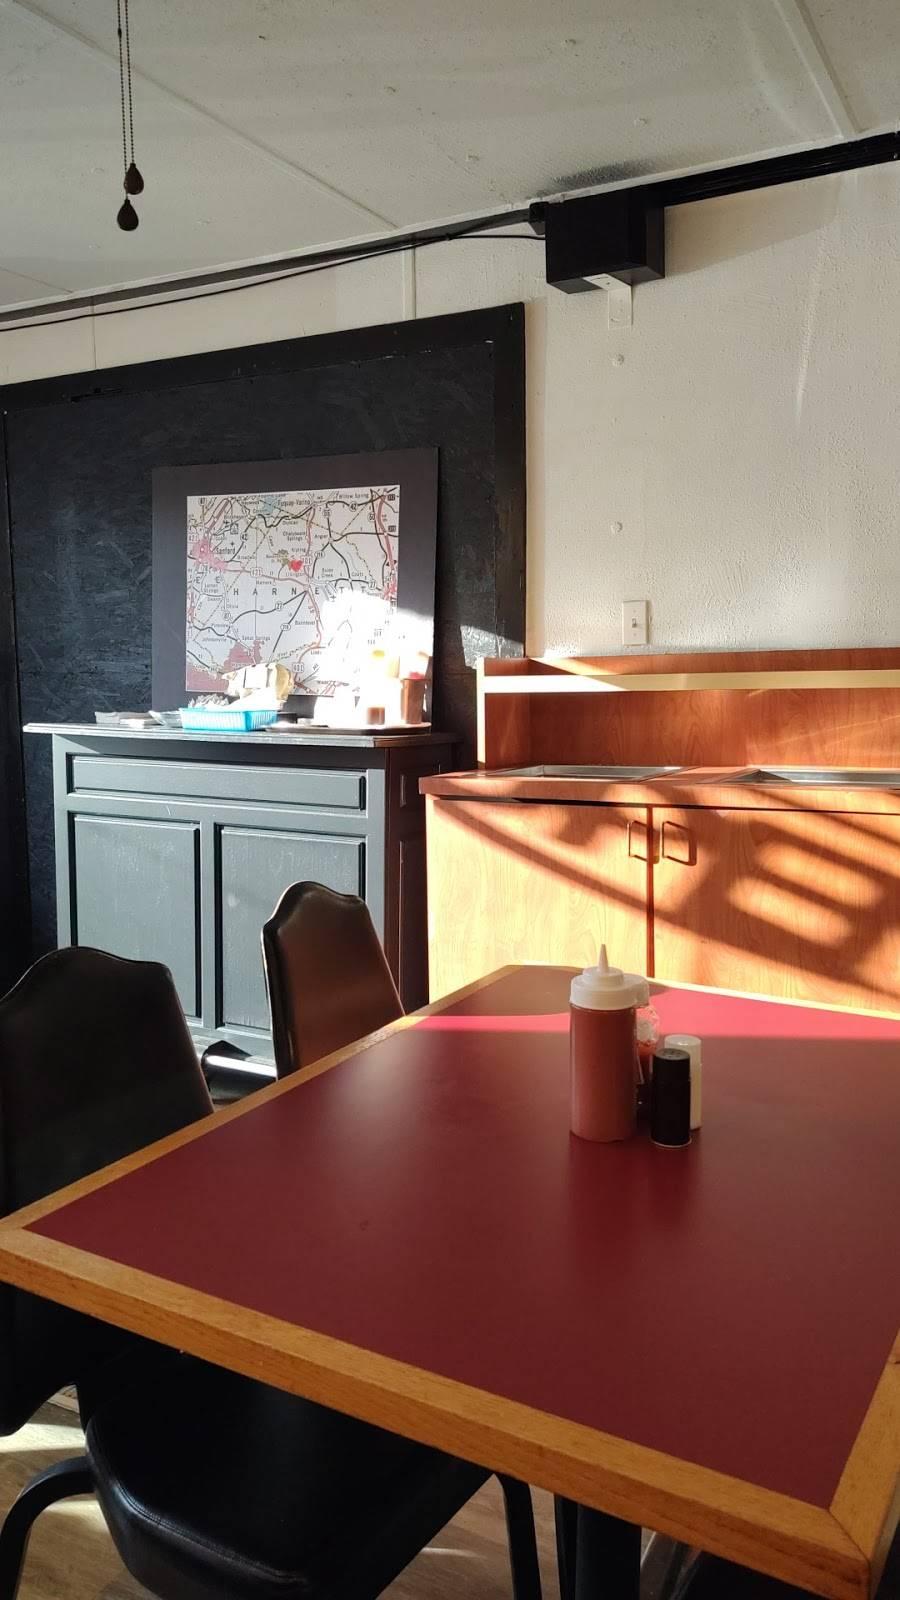 Saucy Wings | restaurant | 301 S Main St, Lillington, NC 27546, USA | 9105149105 OR +1 910-514-9105